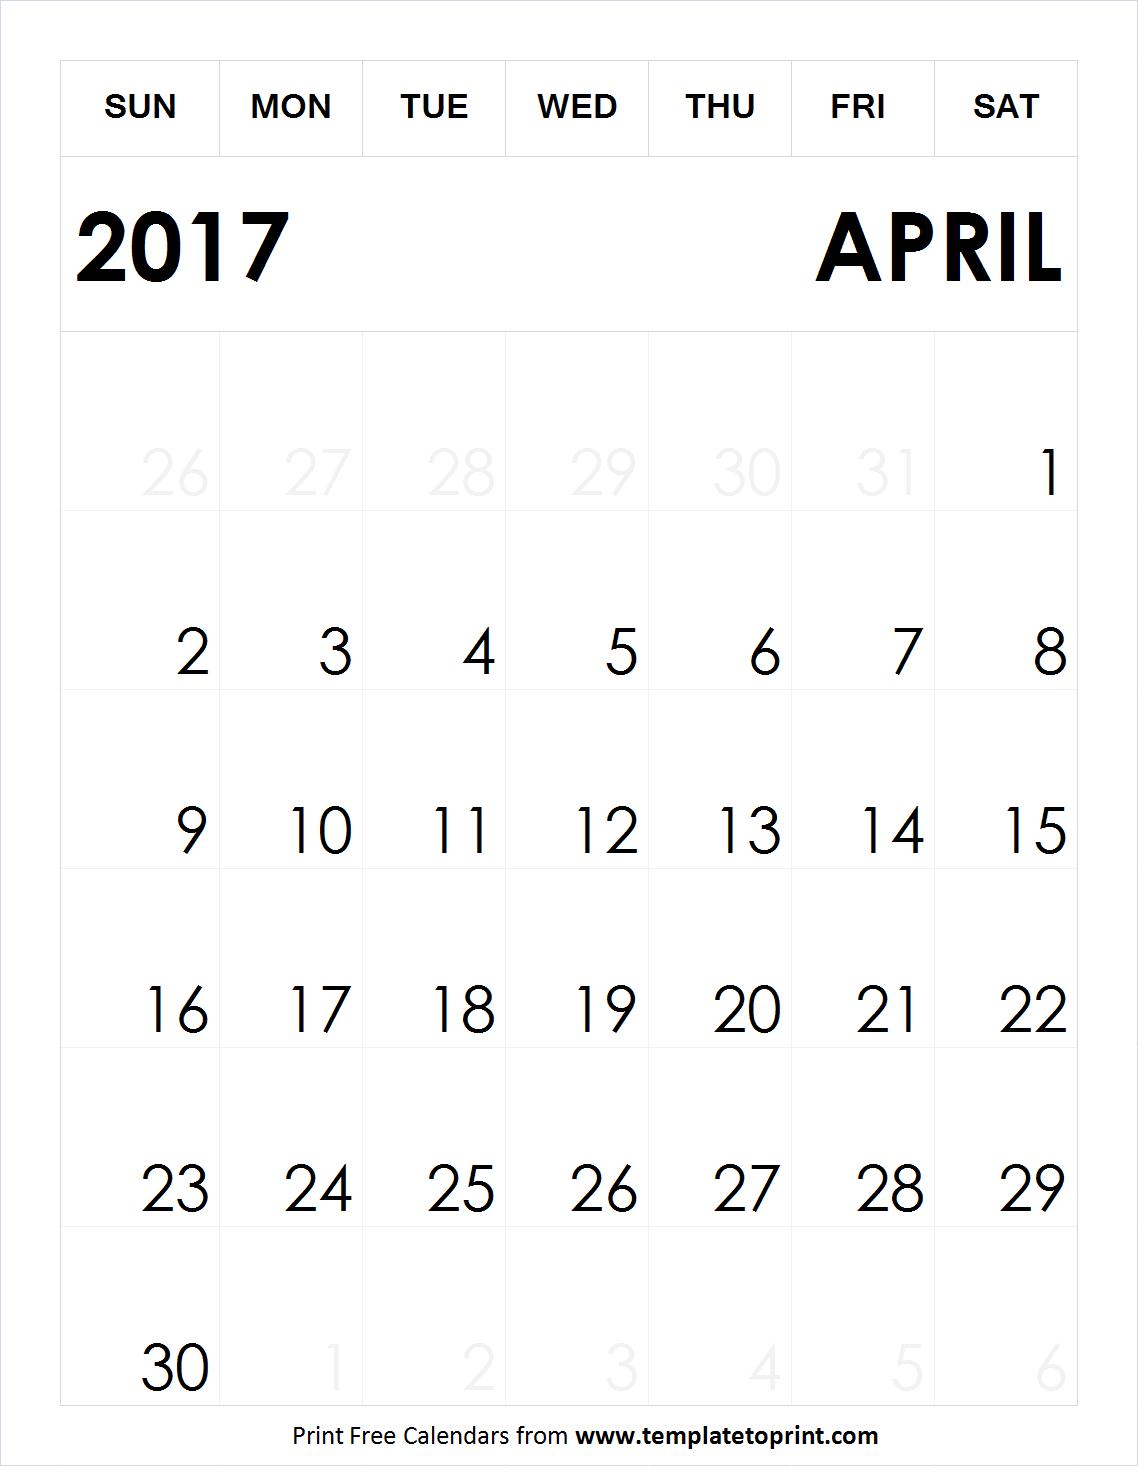 Print Free Blank April 2017 Calendar A4 Size - Calendar April PNG